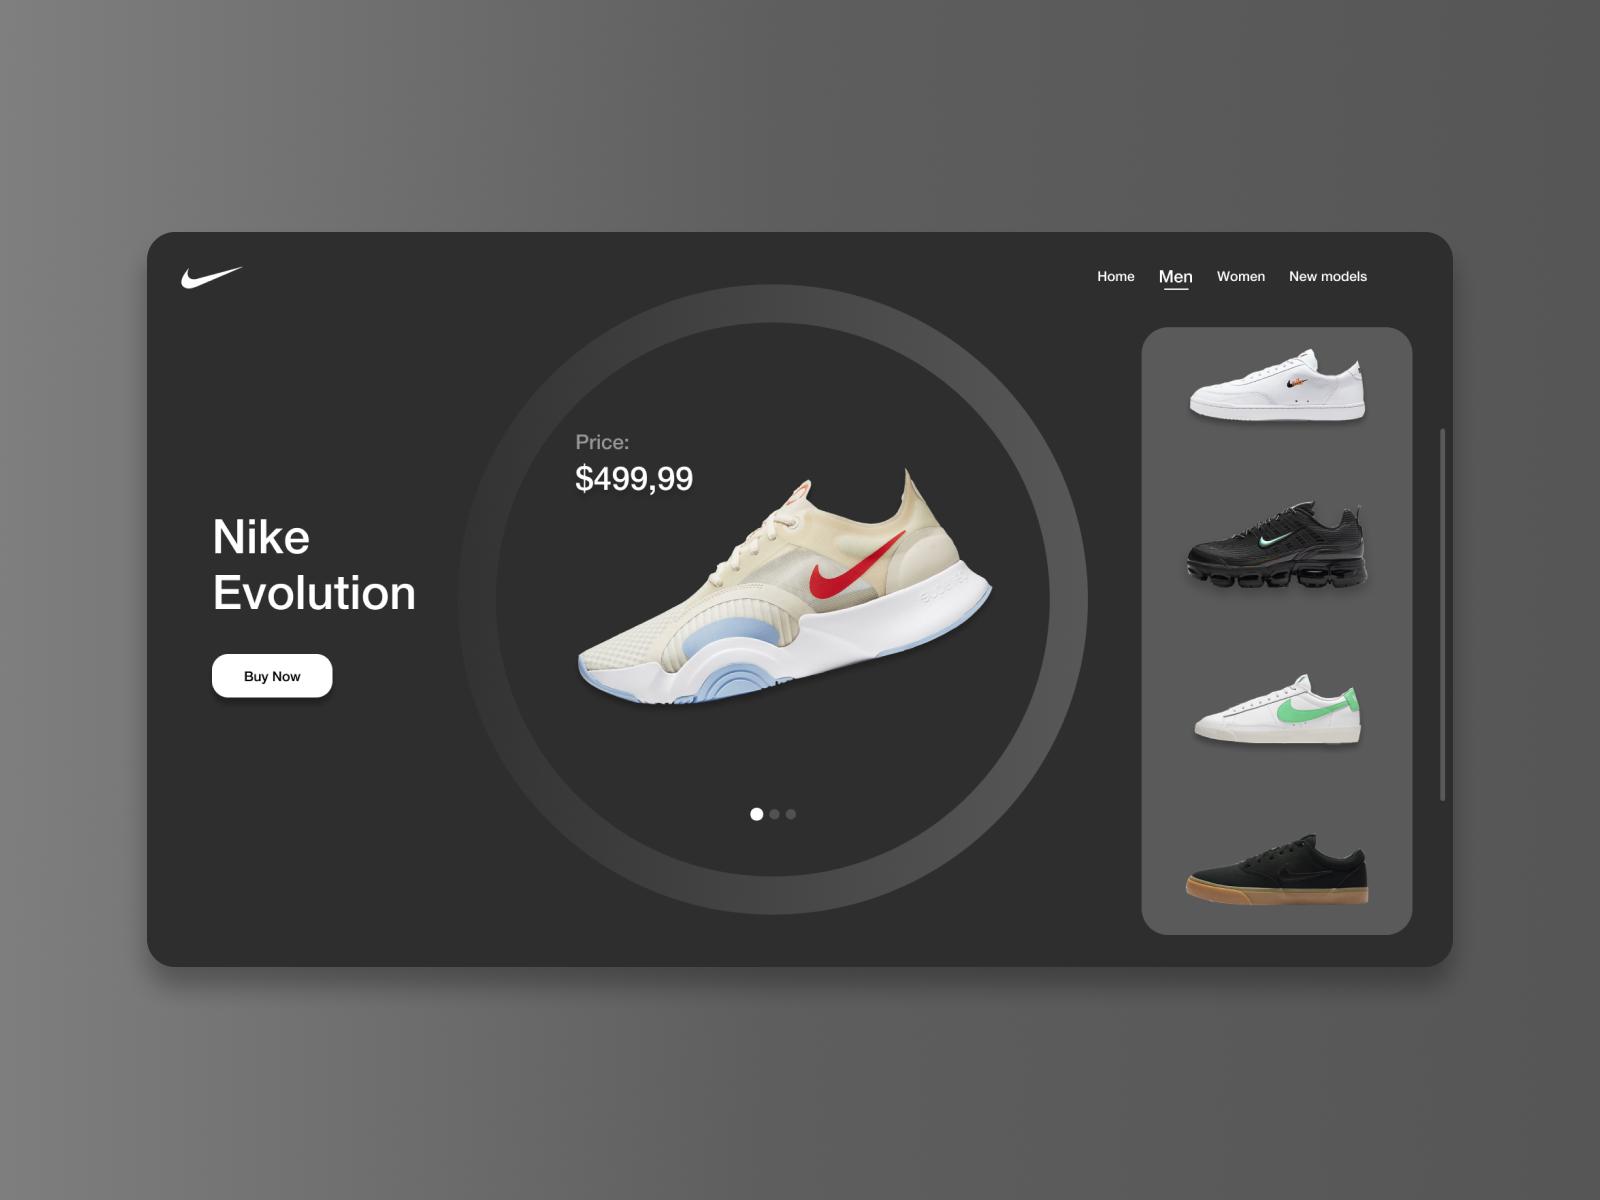 Generosidad humor autoridad  Nike Website - Web Design by Bosko Vidojevic on Dribbble